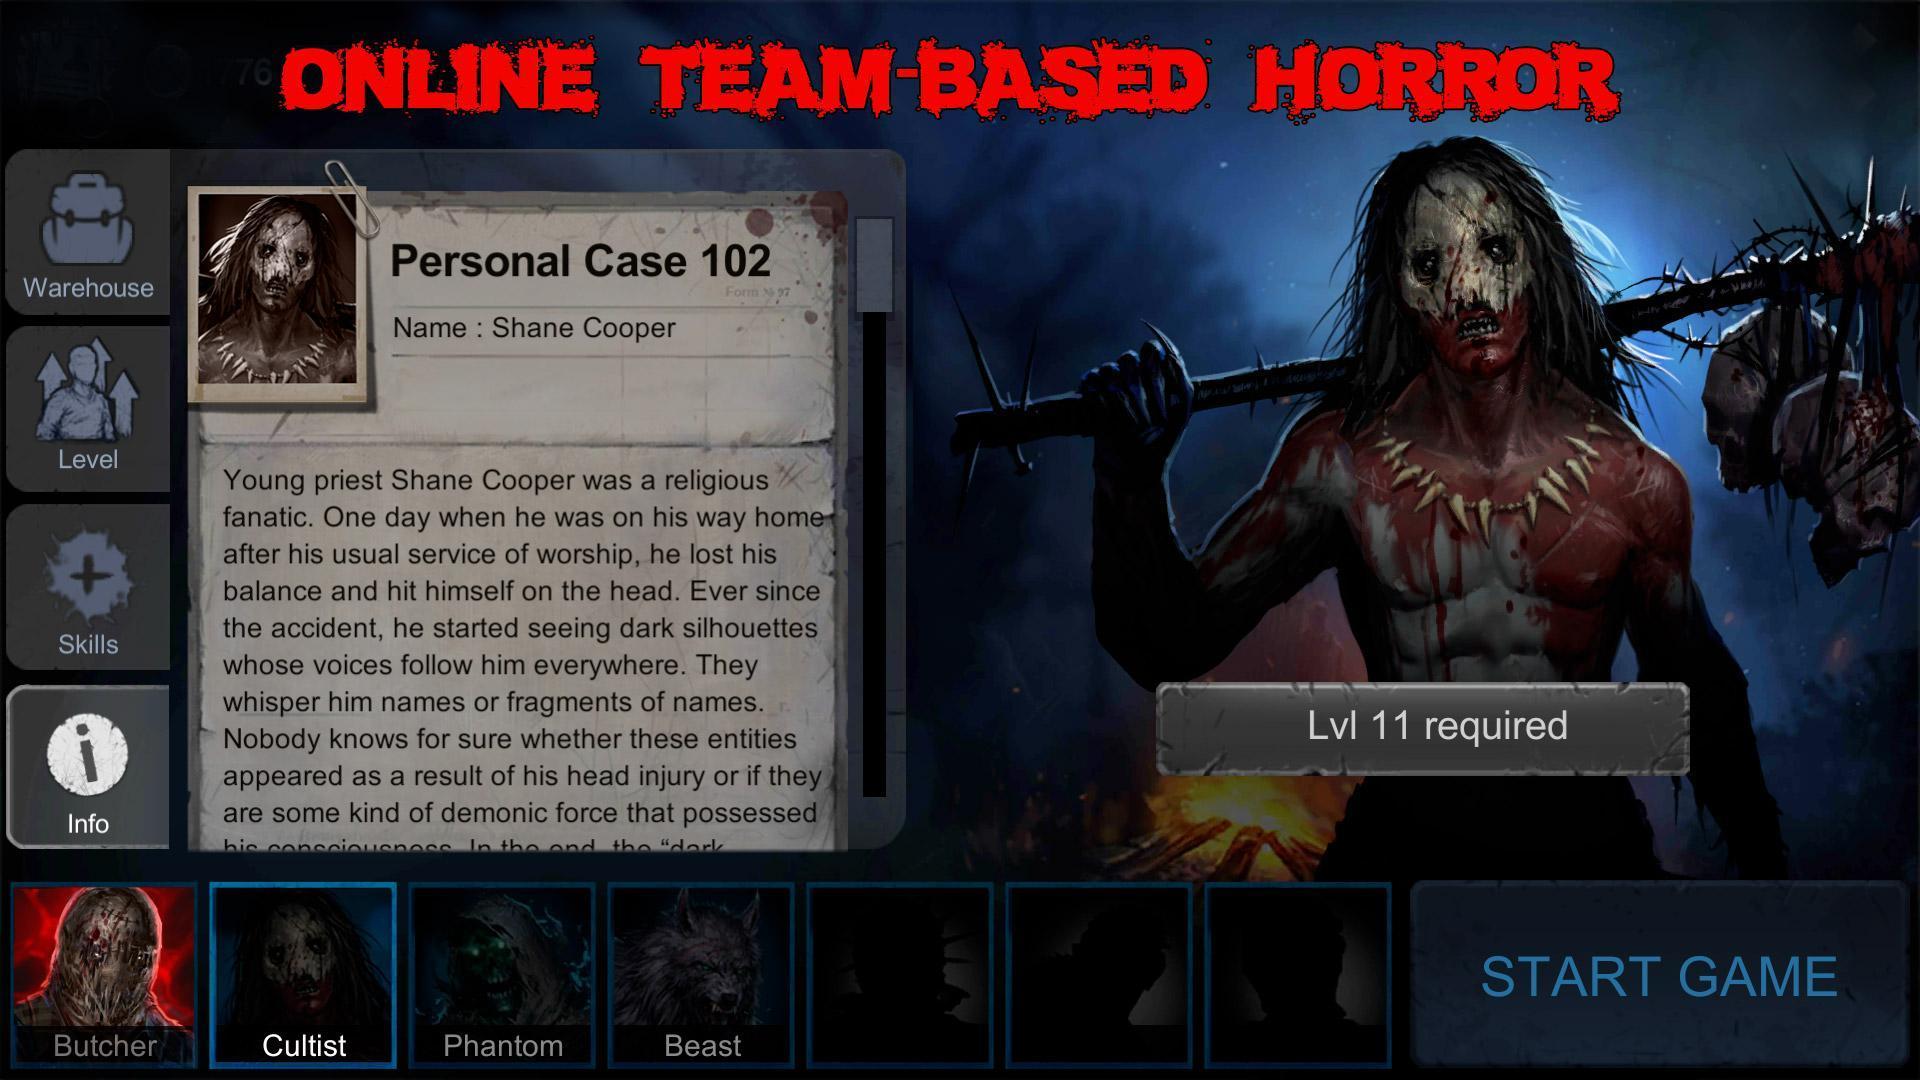 Horrorfield Multiplayer Survival Horror Game 1.3.6 Screenshot 1